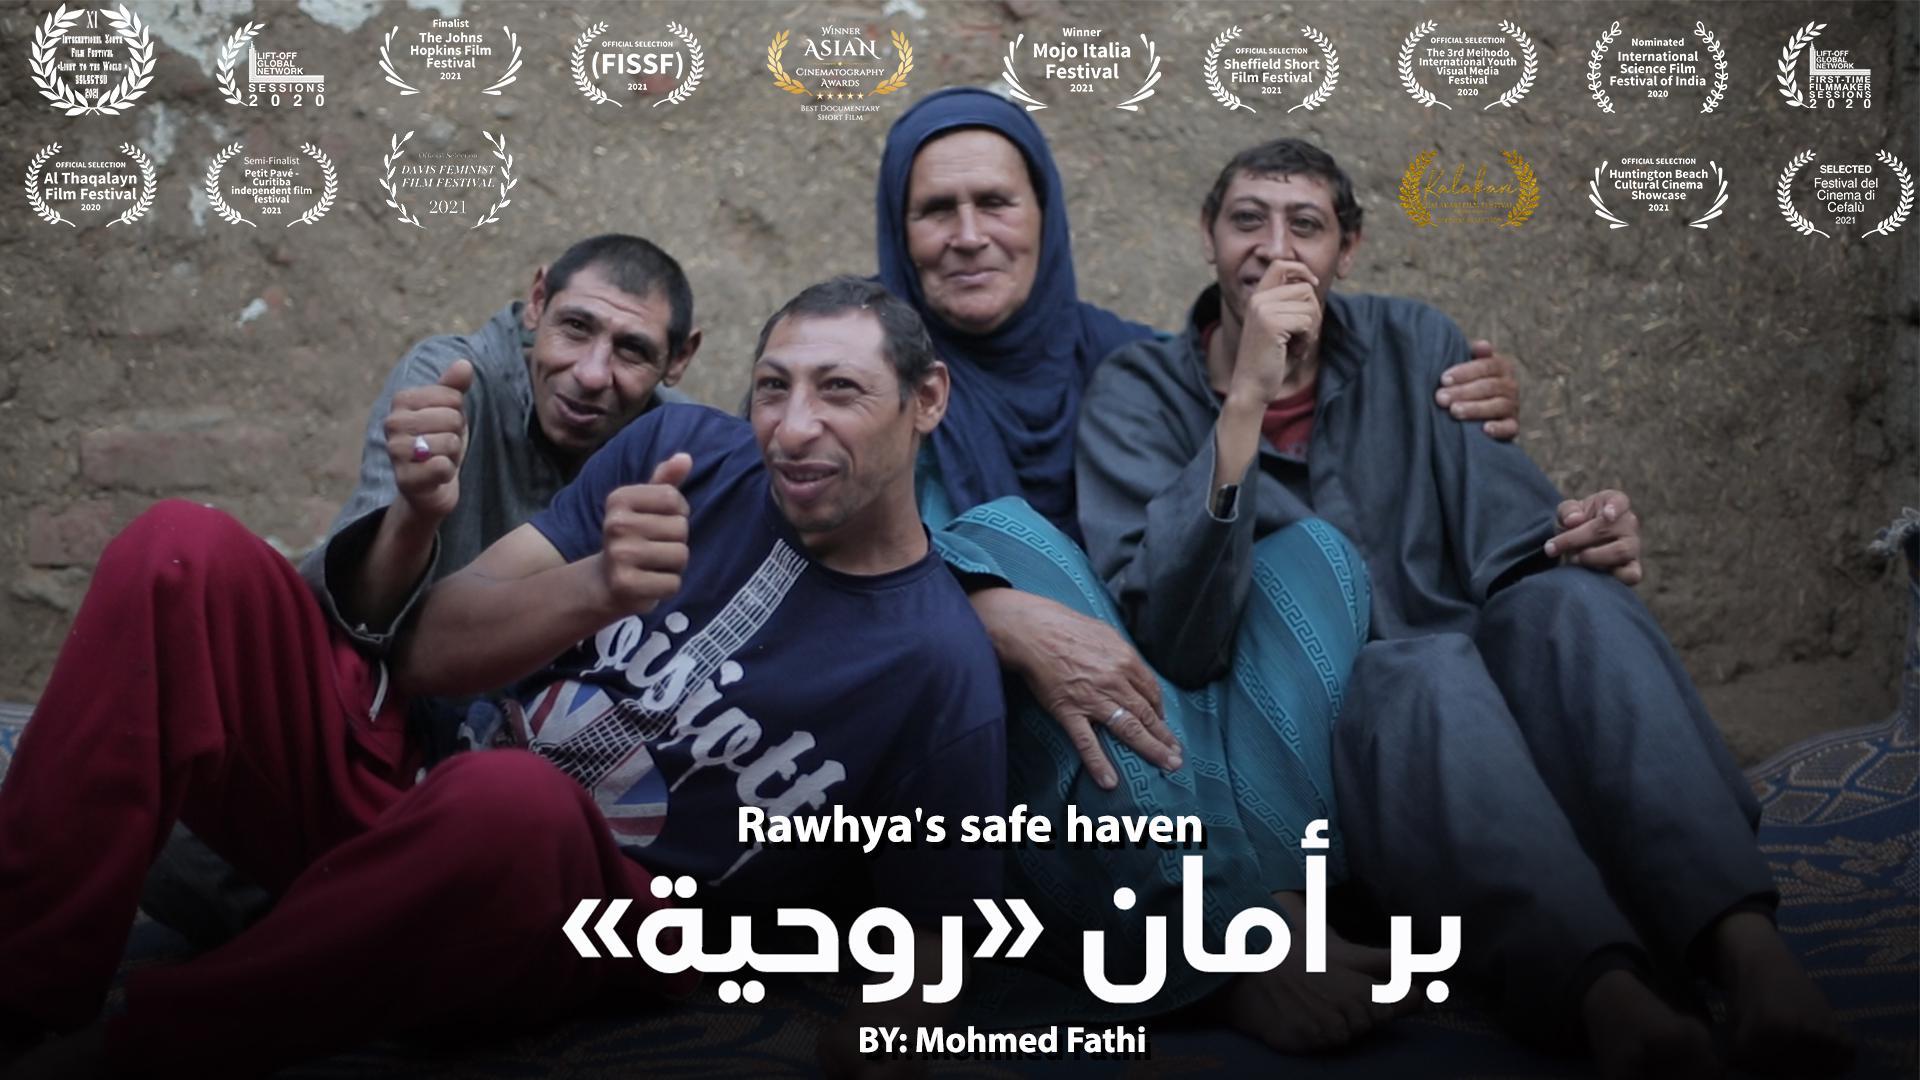 Rawhya's safe haven